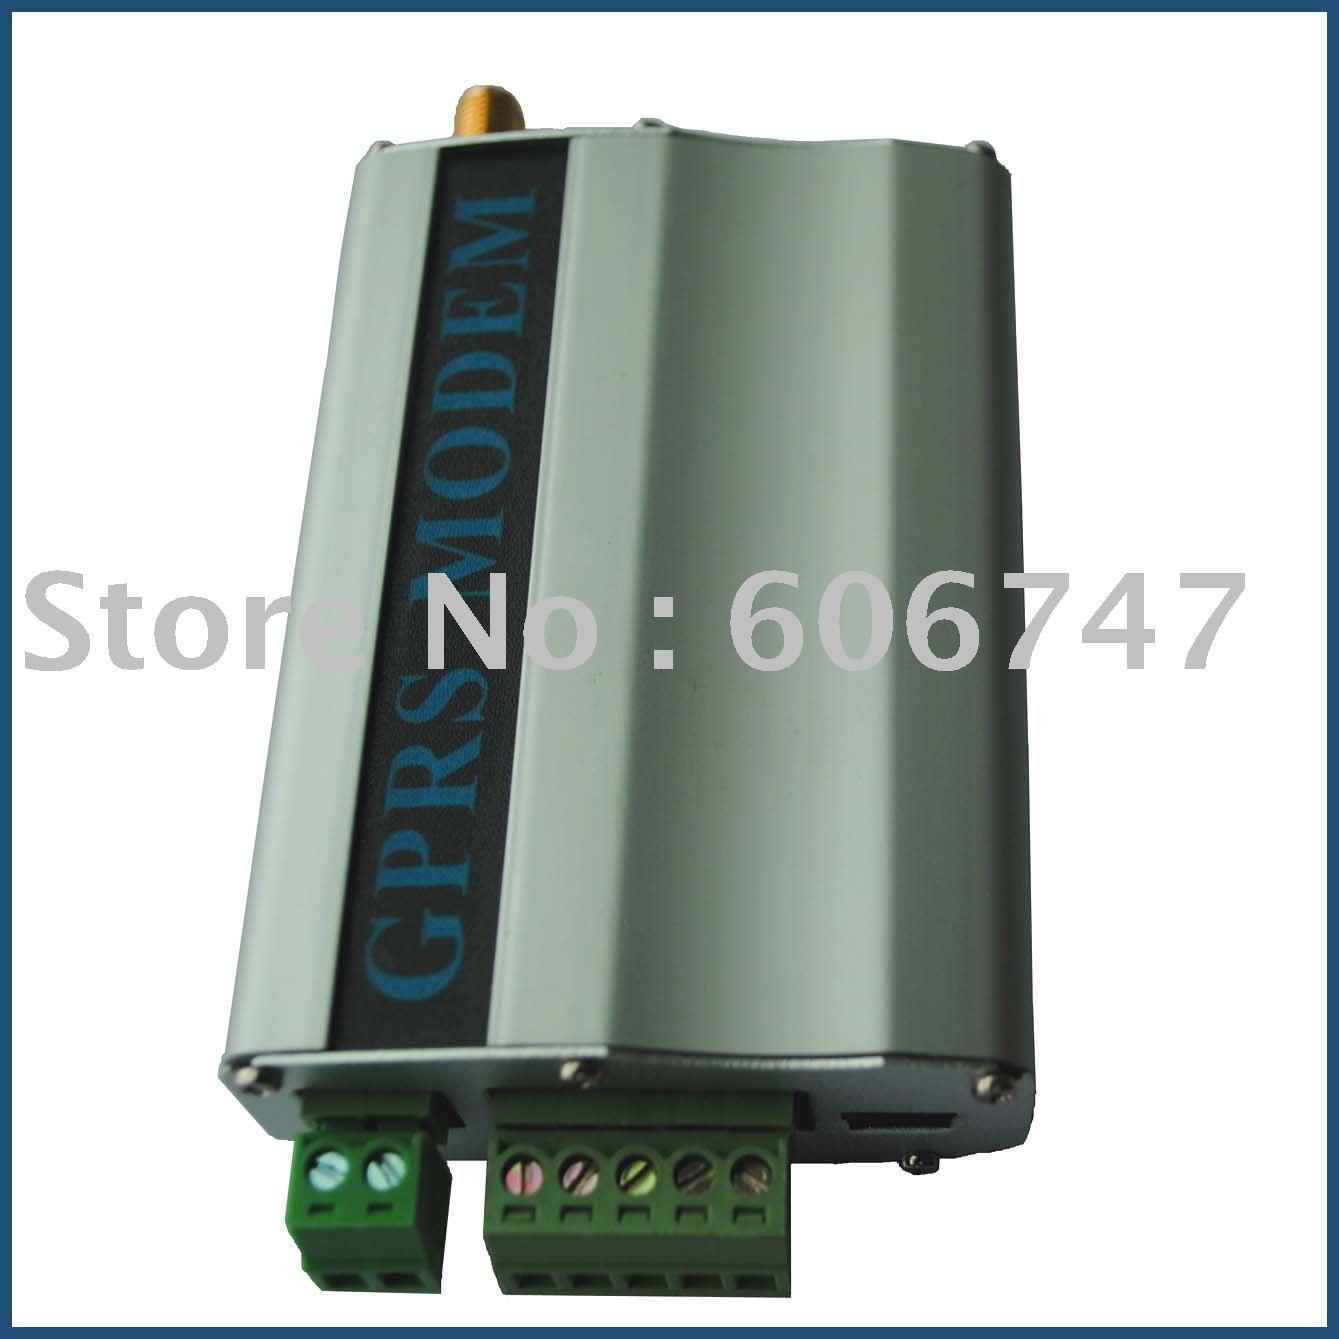 LT323 RS485 GSM/GPRS MODEM